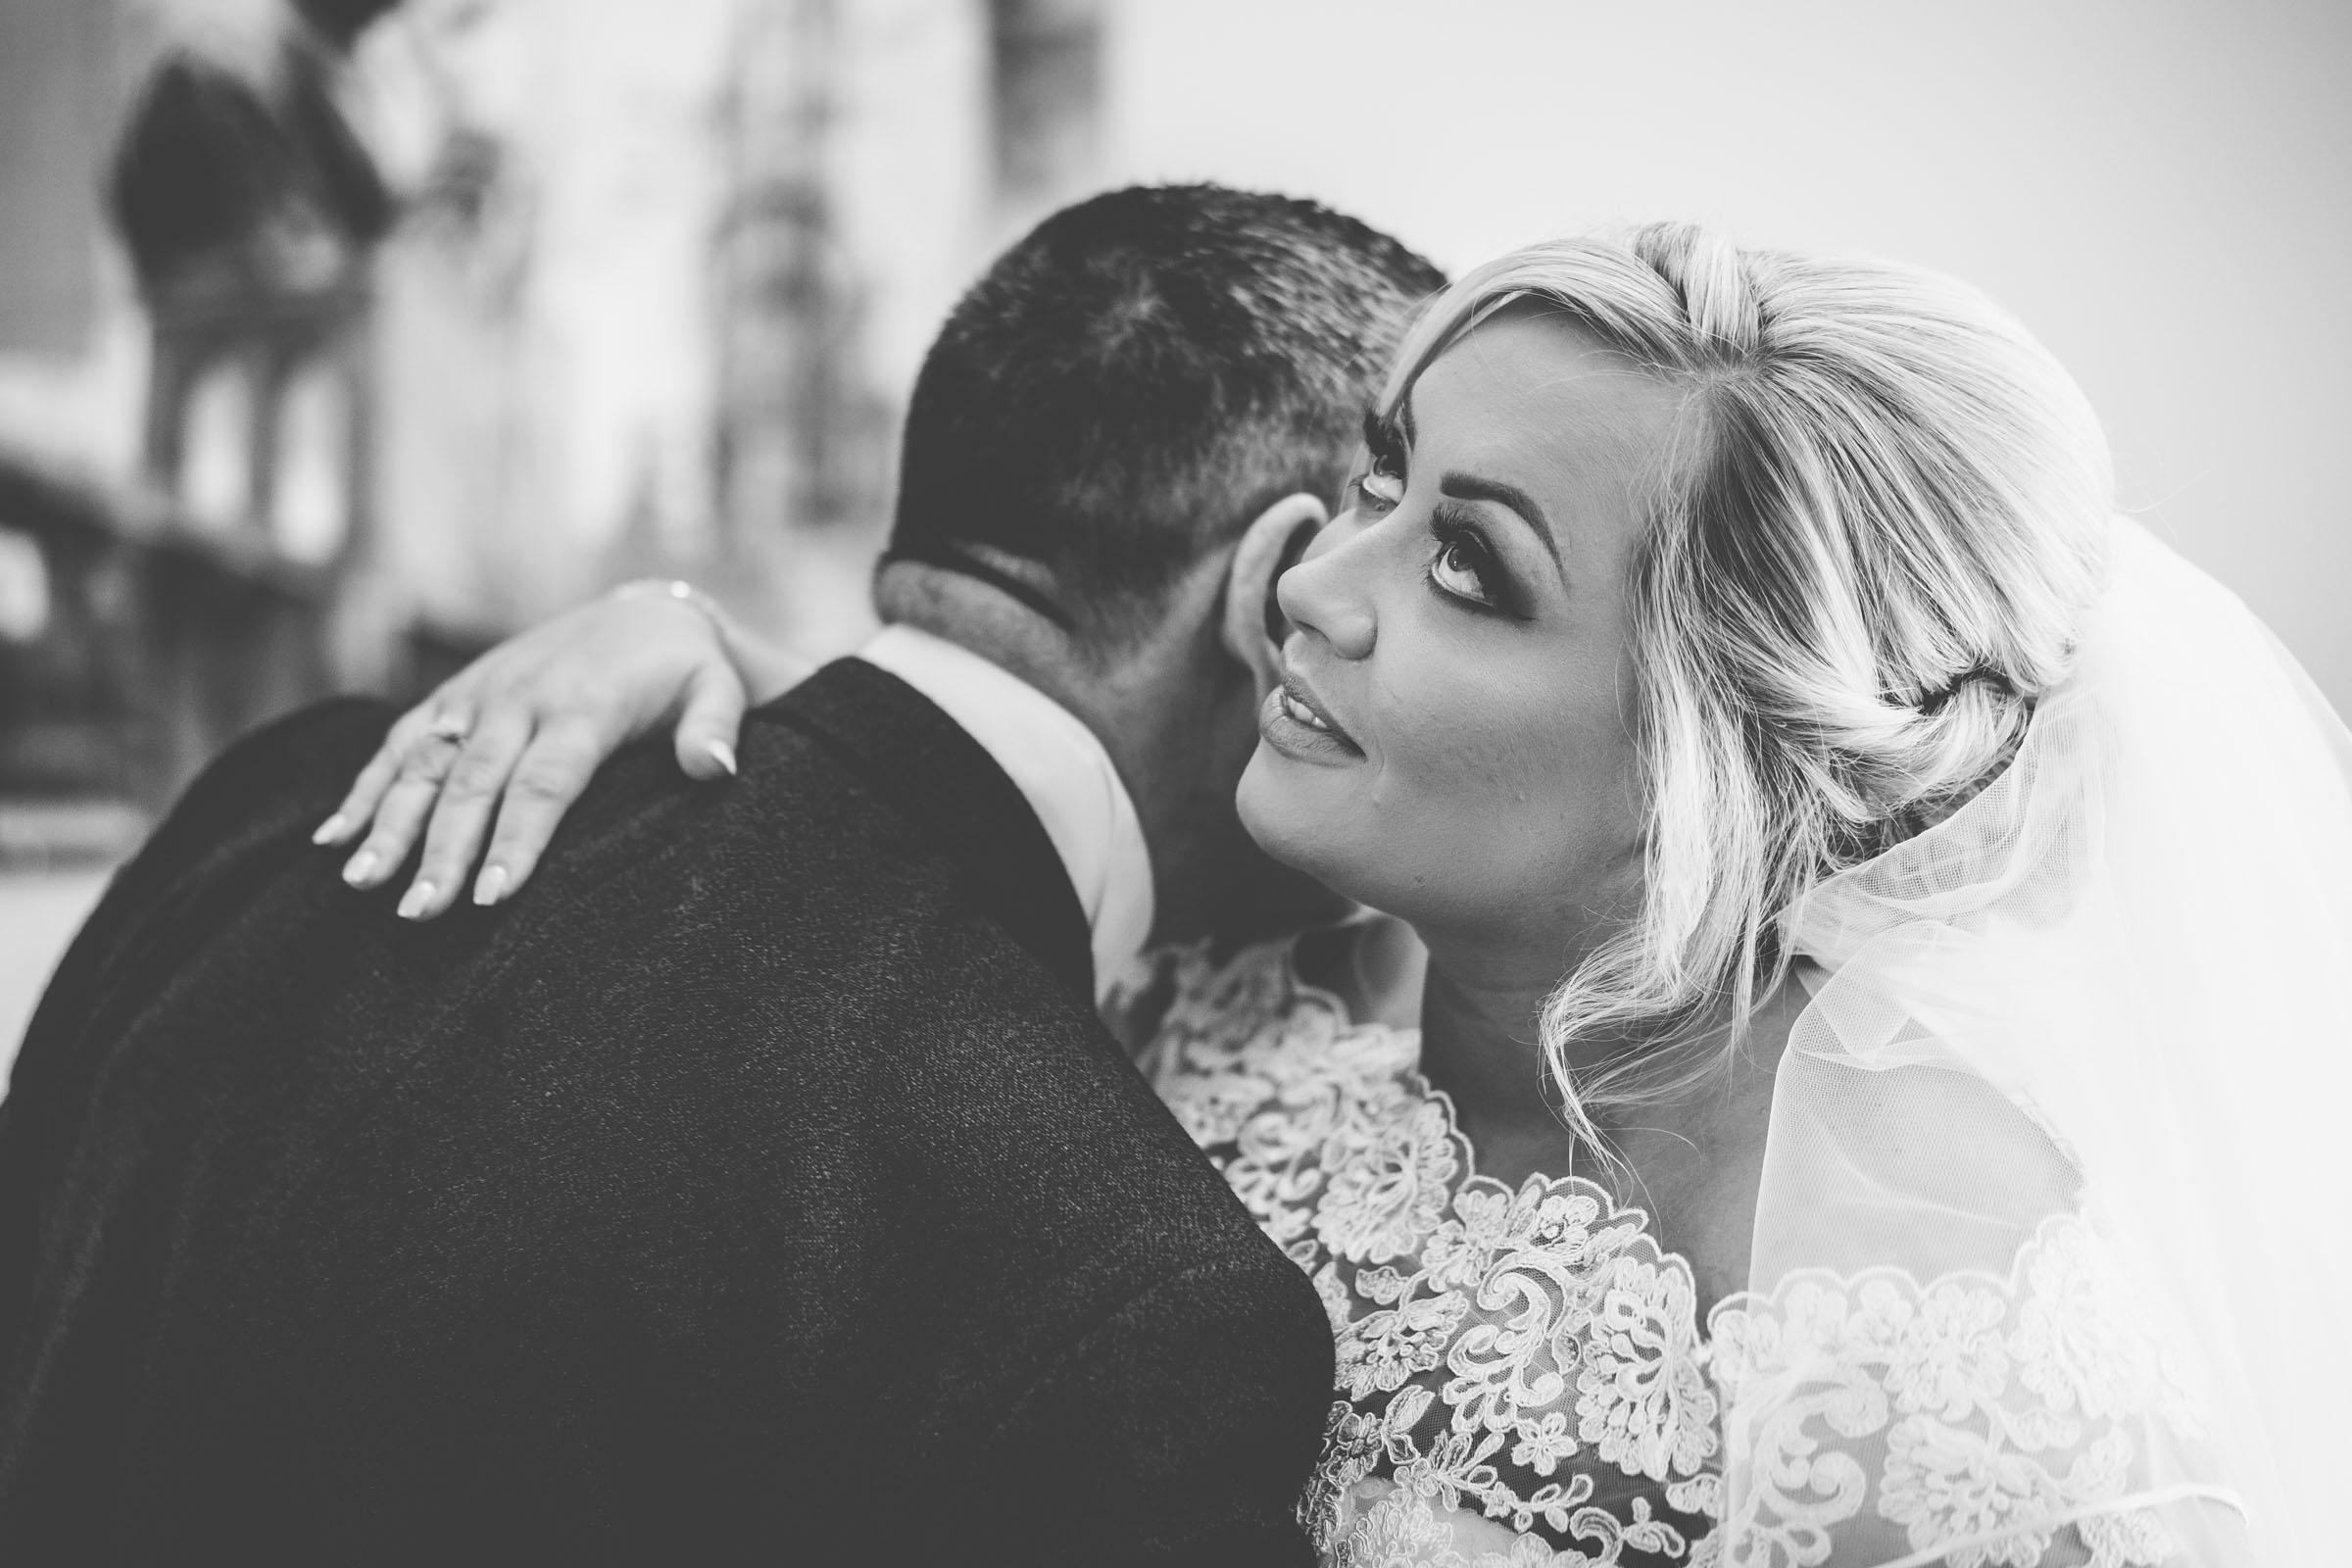 motherwell-moorings-wedding-photographer-dearlyphotography (20 of 77).jpg